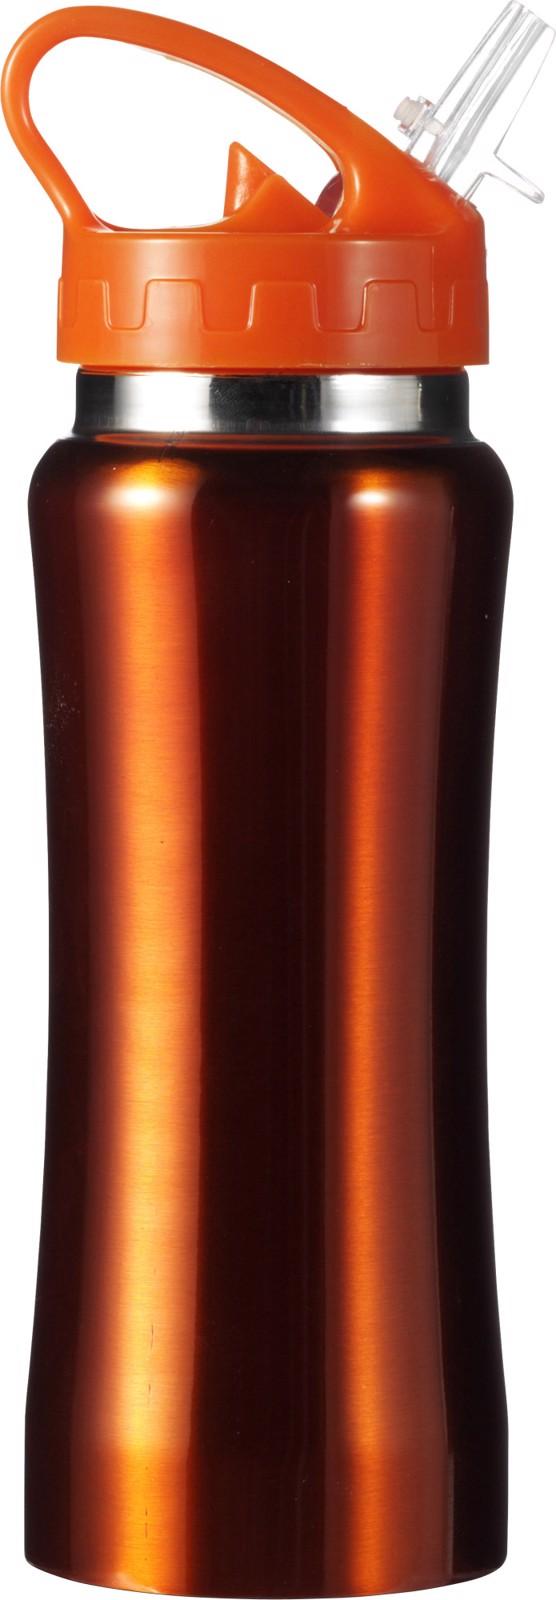 Stainless steel bottle - Orange